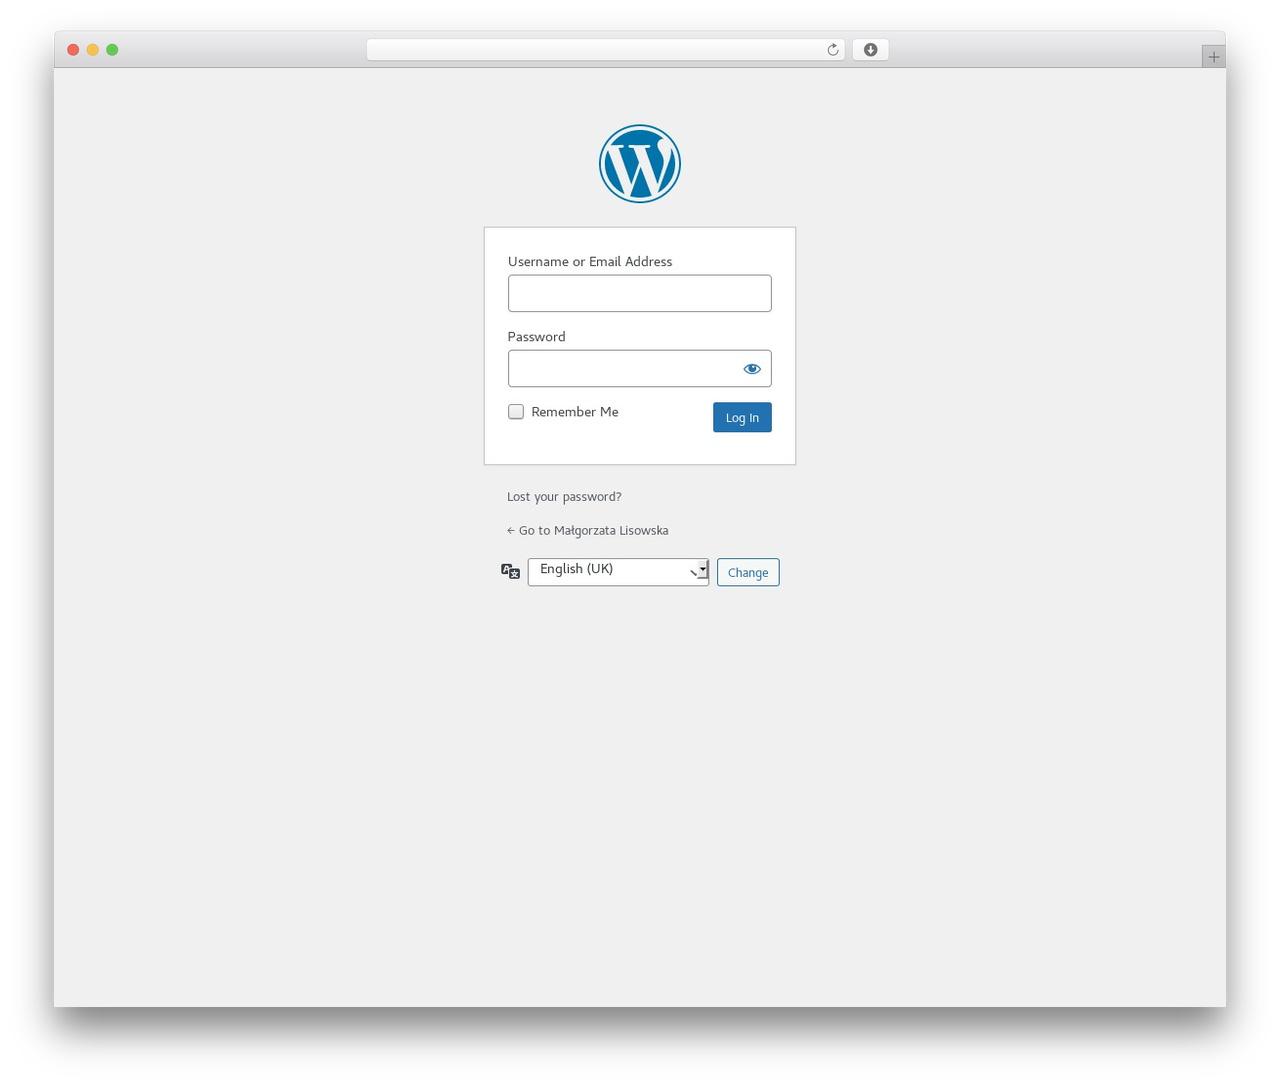 Toniq premium WordPress theme - lisowskamalgorzata.com/wp-login.php?redirect_to=lisowskamalgorzata.com